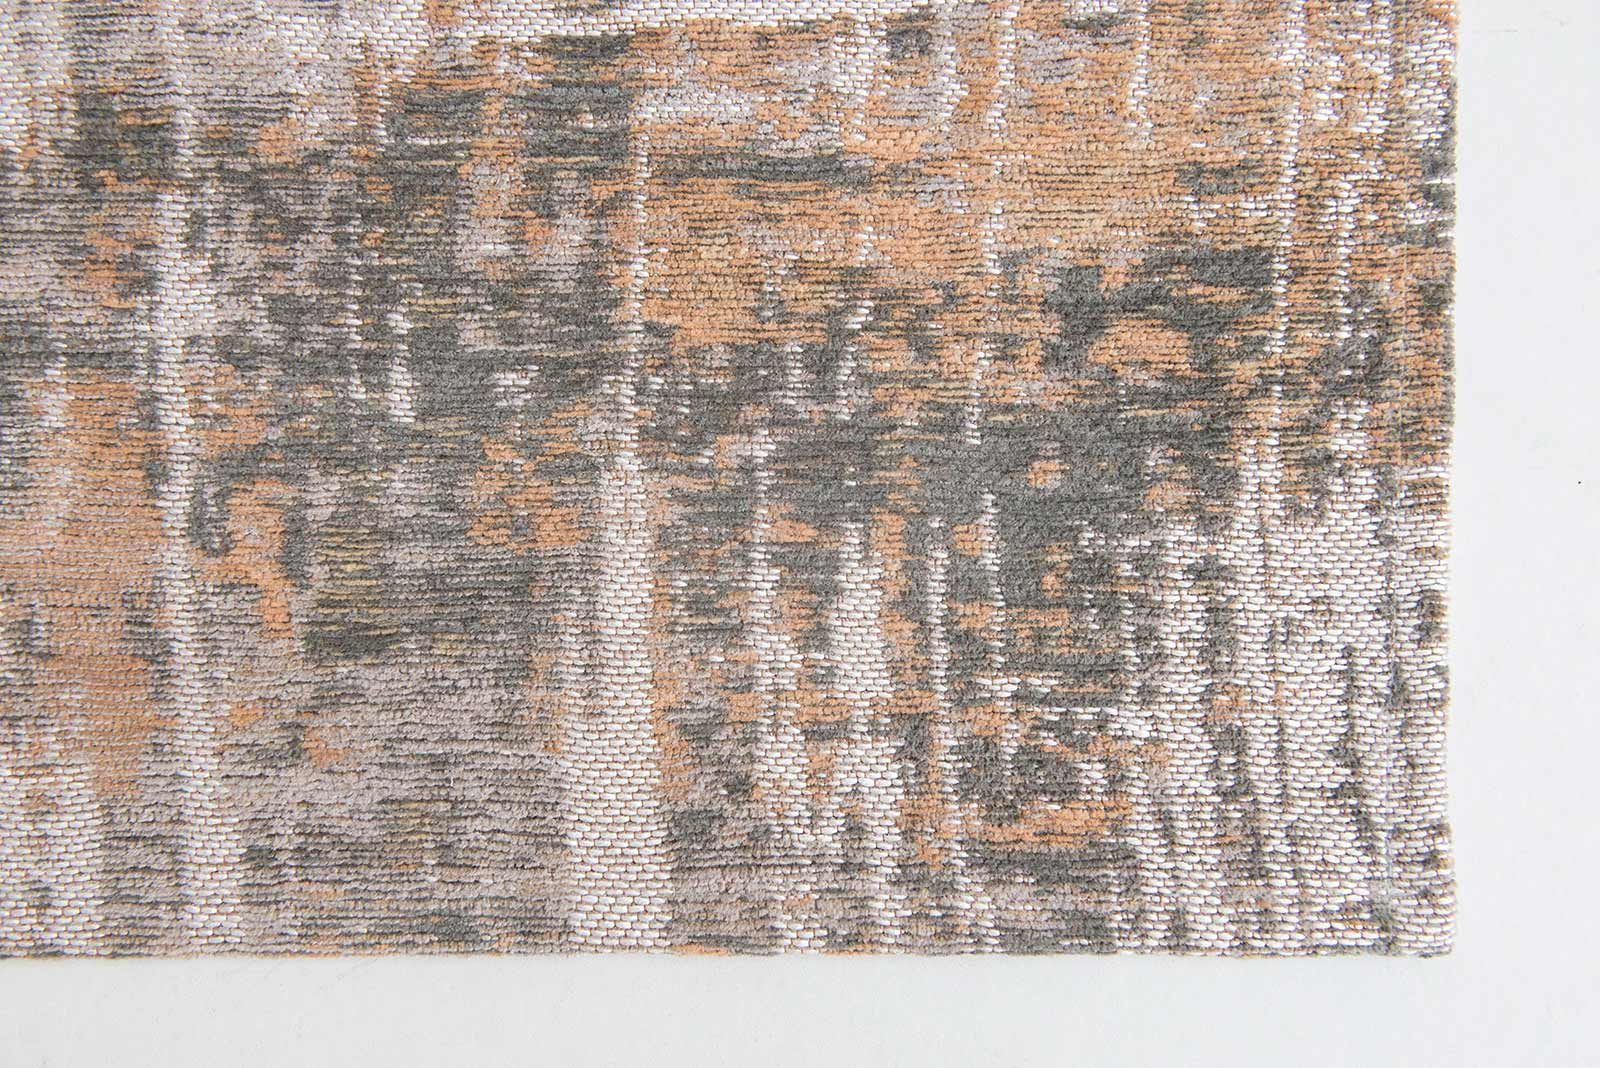 rugs Louis De Poortere LX8717 Atlantic Streaks Parsons Powder corner